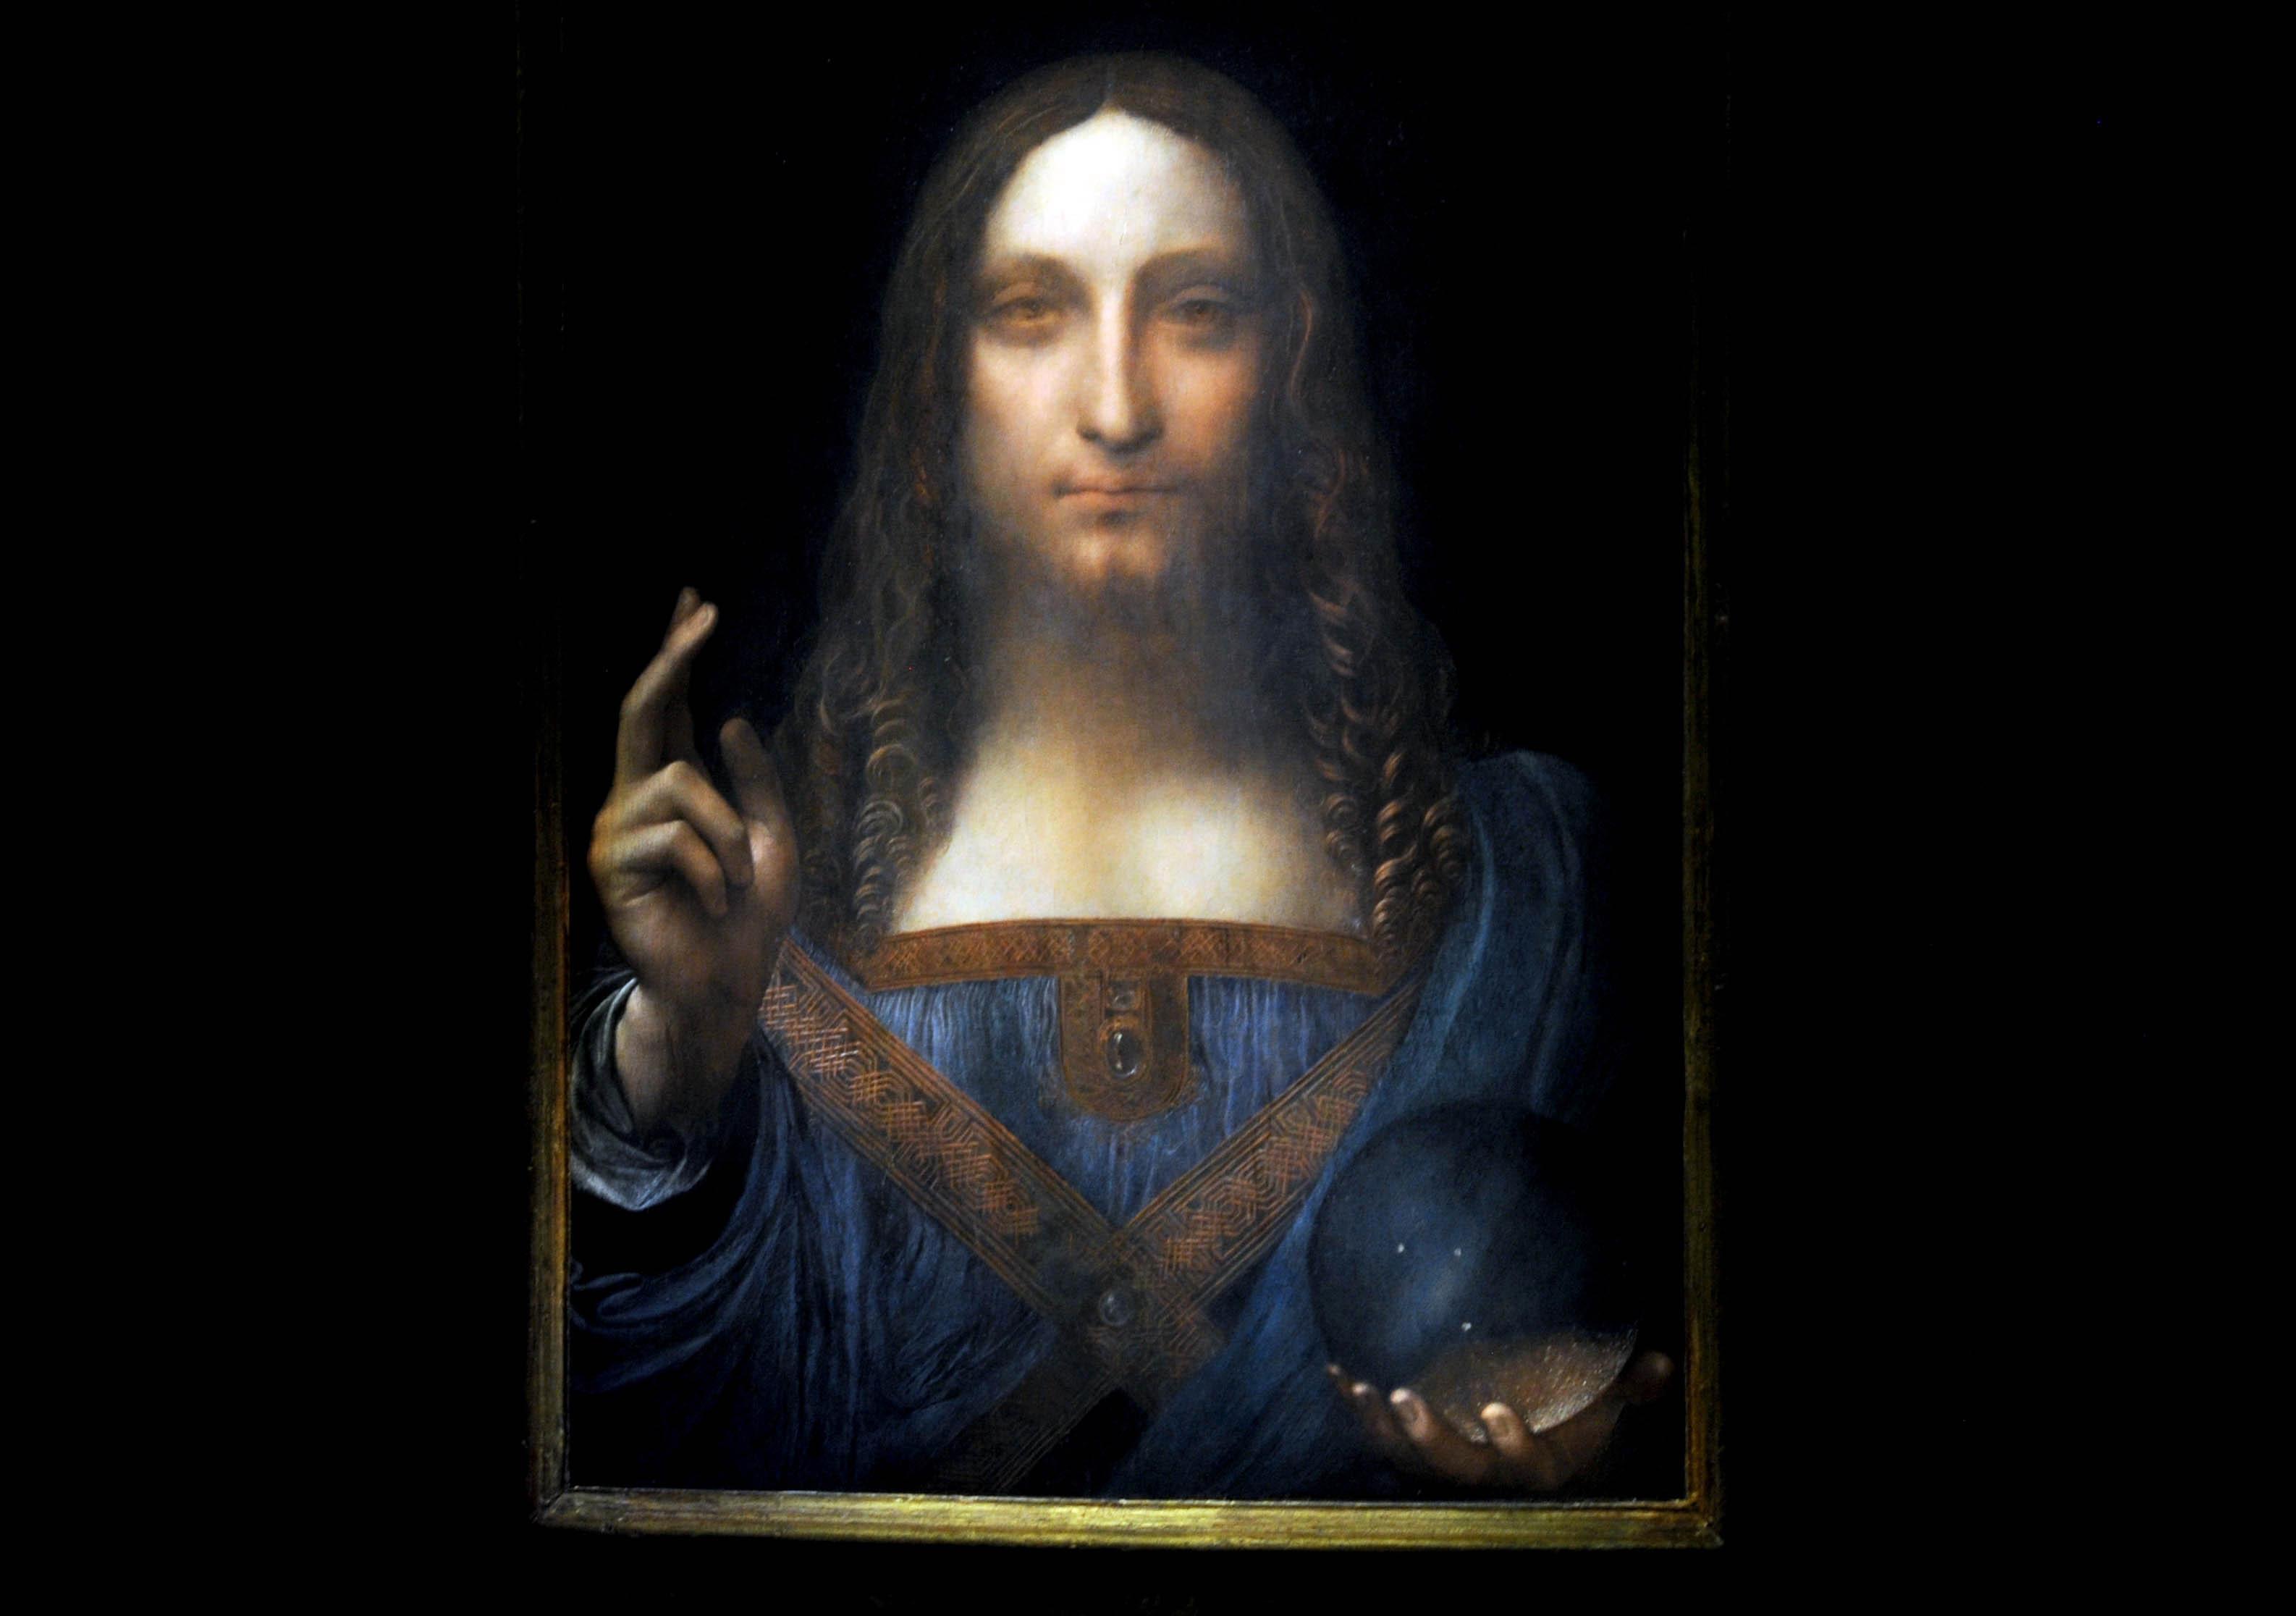 Report: A missing $450 million Leonardo da Vinci been hiding on a Saudi prince's superyacht